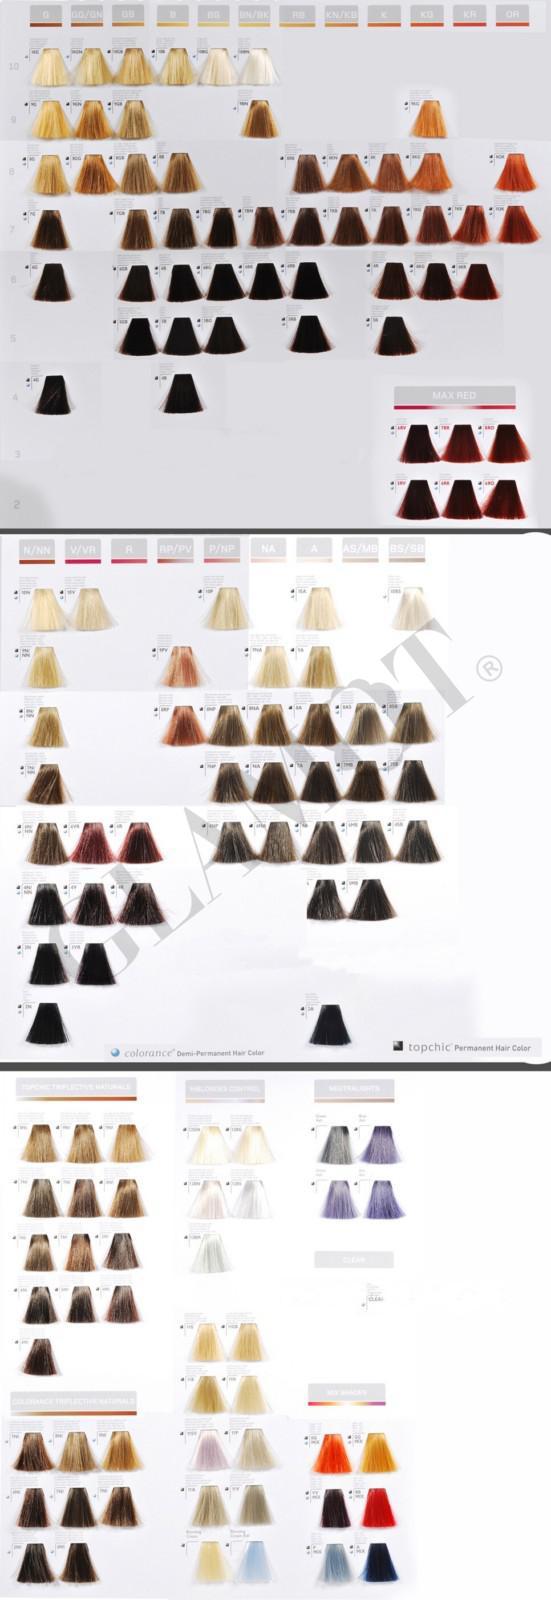 Goldwell Colorance Colorance Glamot